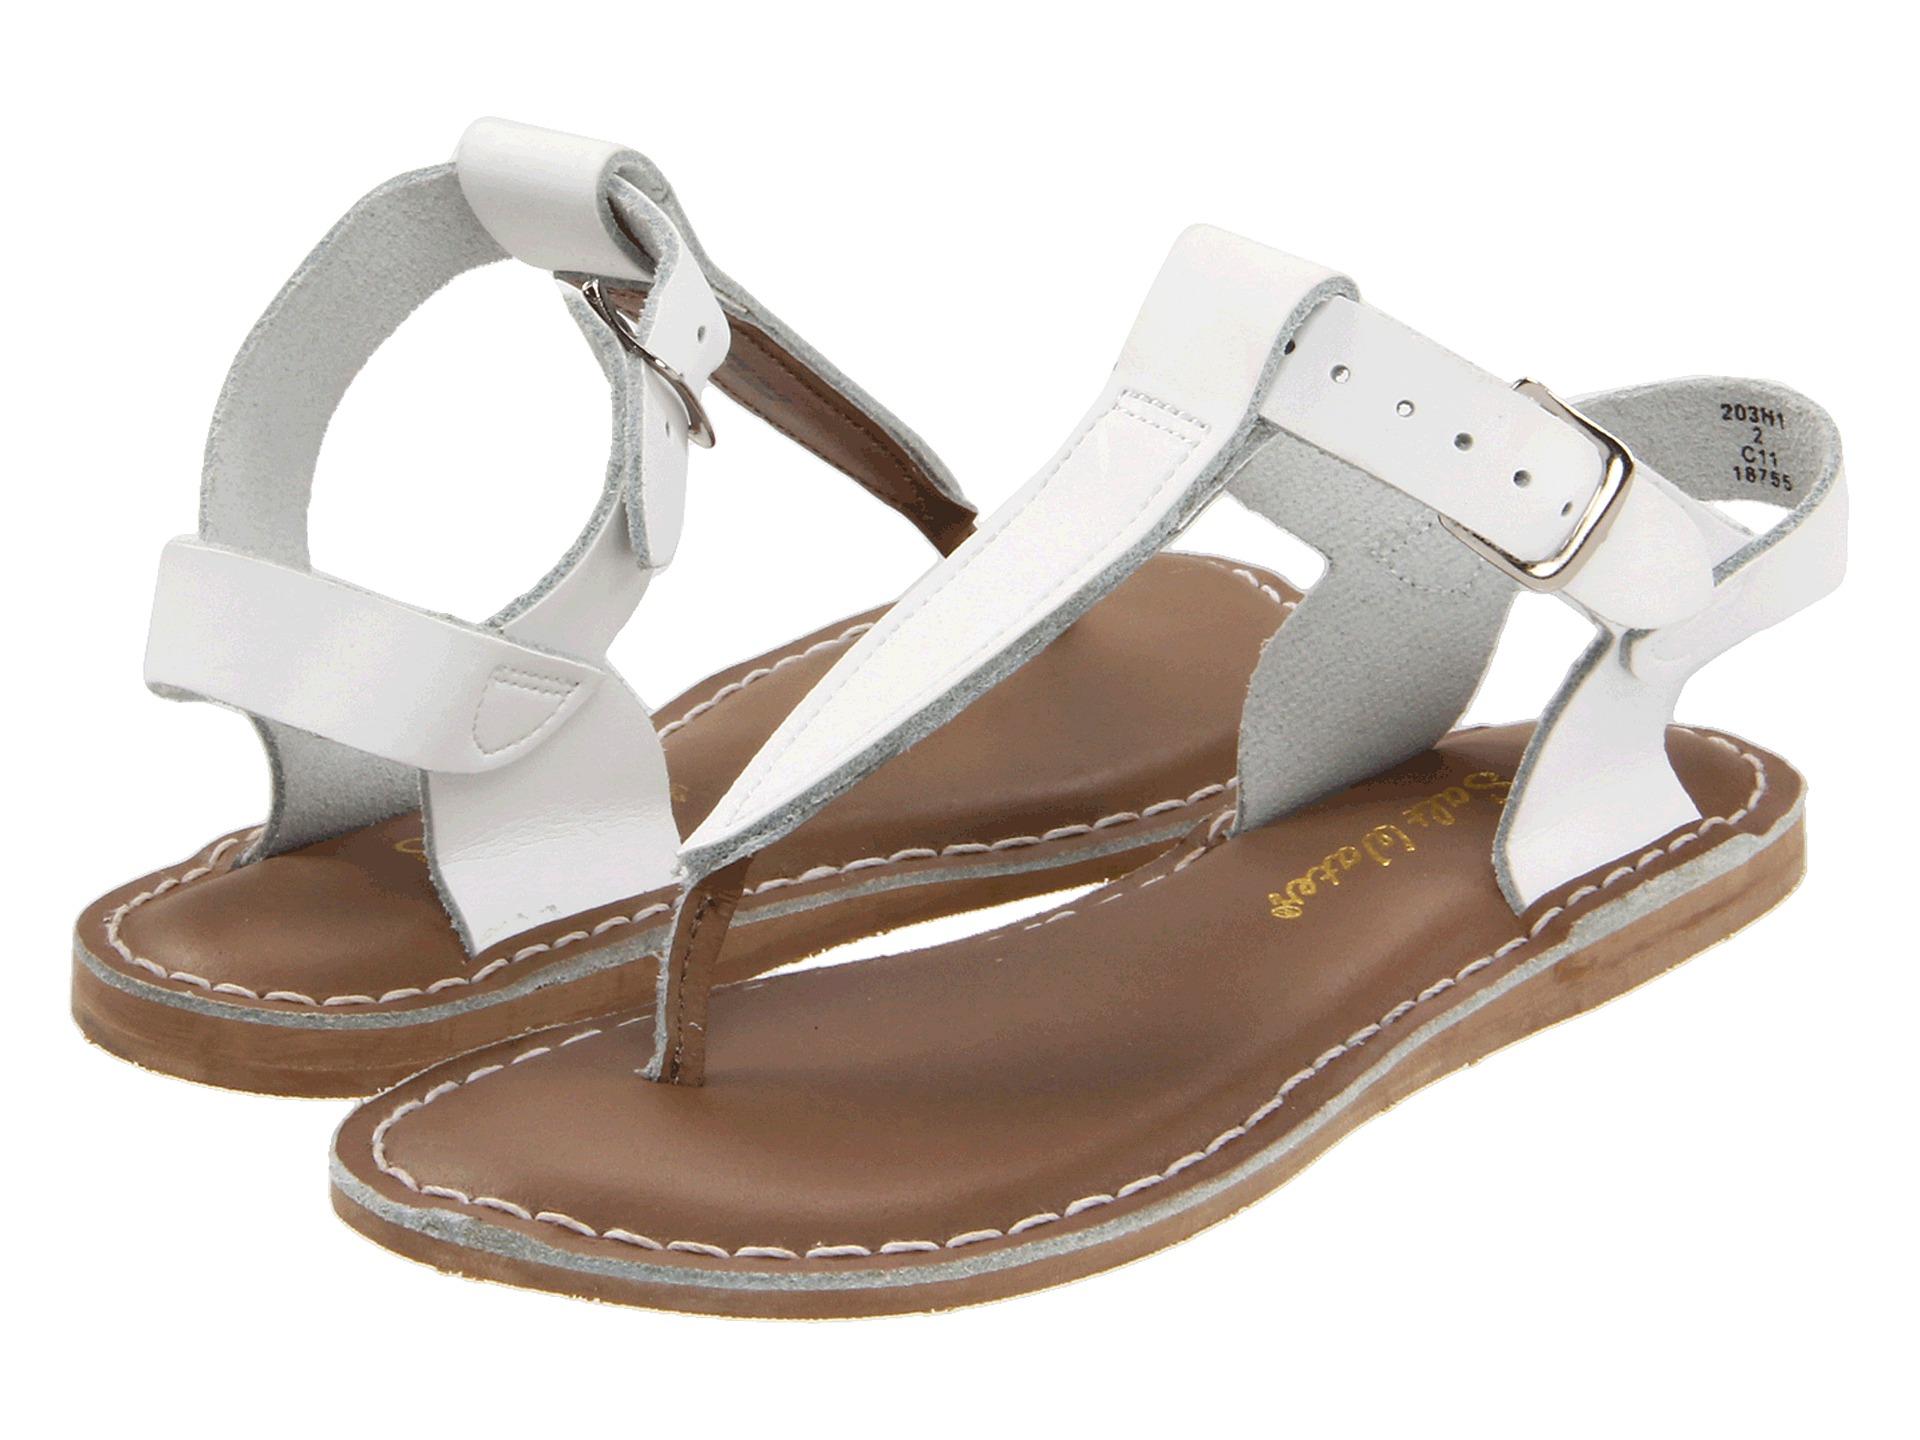 salt water sandal by hoy shoes sun san t thongs toddler little kid free. Black Bedroom Furniture Sets. Home Design Ideas